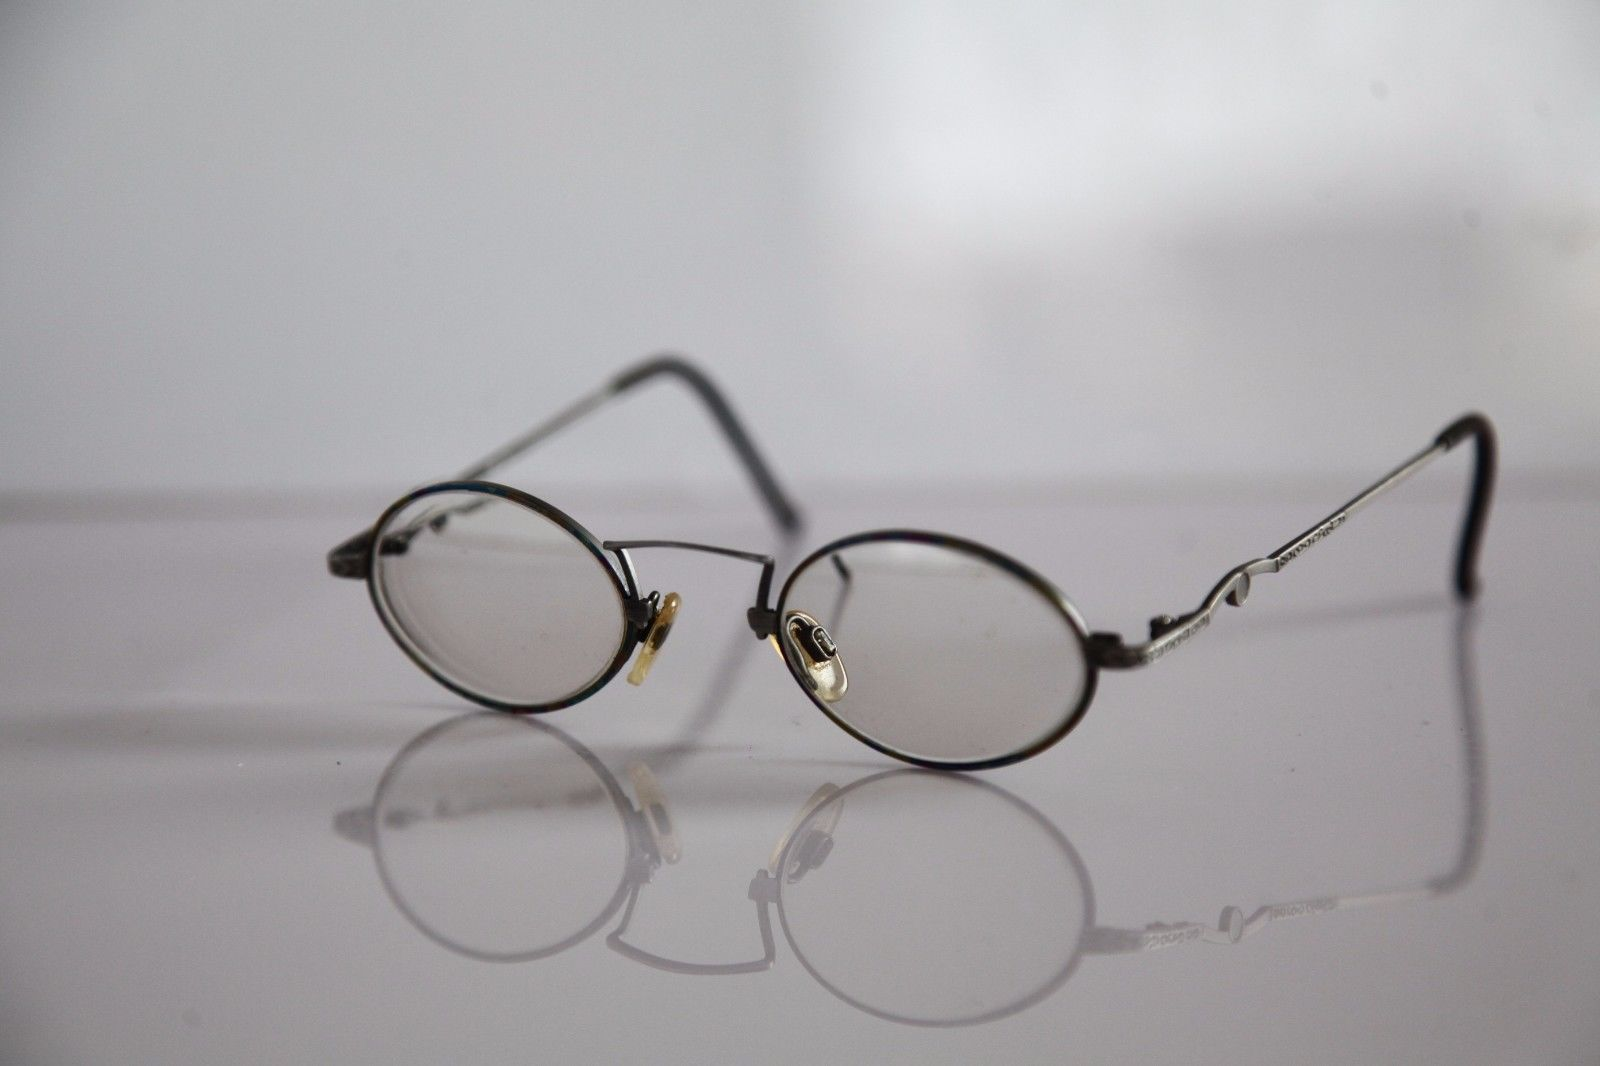 CLAUDIO P. Eyewear, Silver Frame, RX-Able Prescription lenses. Made in Italy